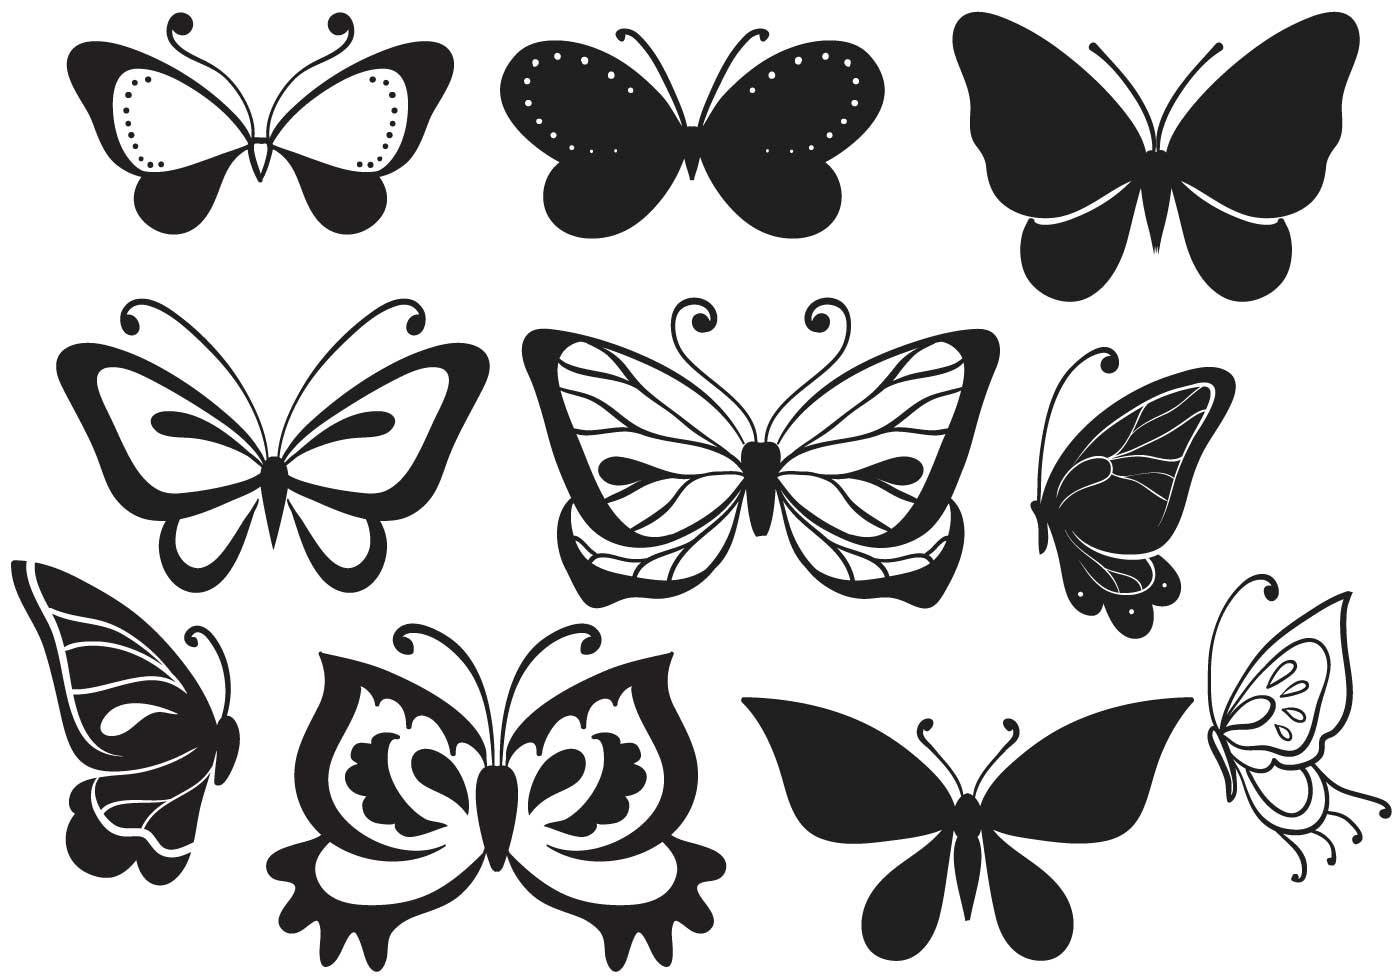 Kostenlose Schmetterlings Vektoren - Kostenlose Vektor-Kunst, Archiv ...